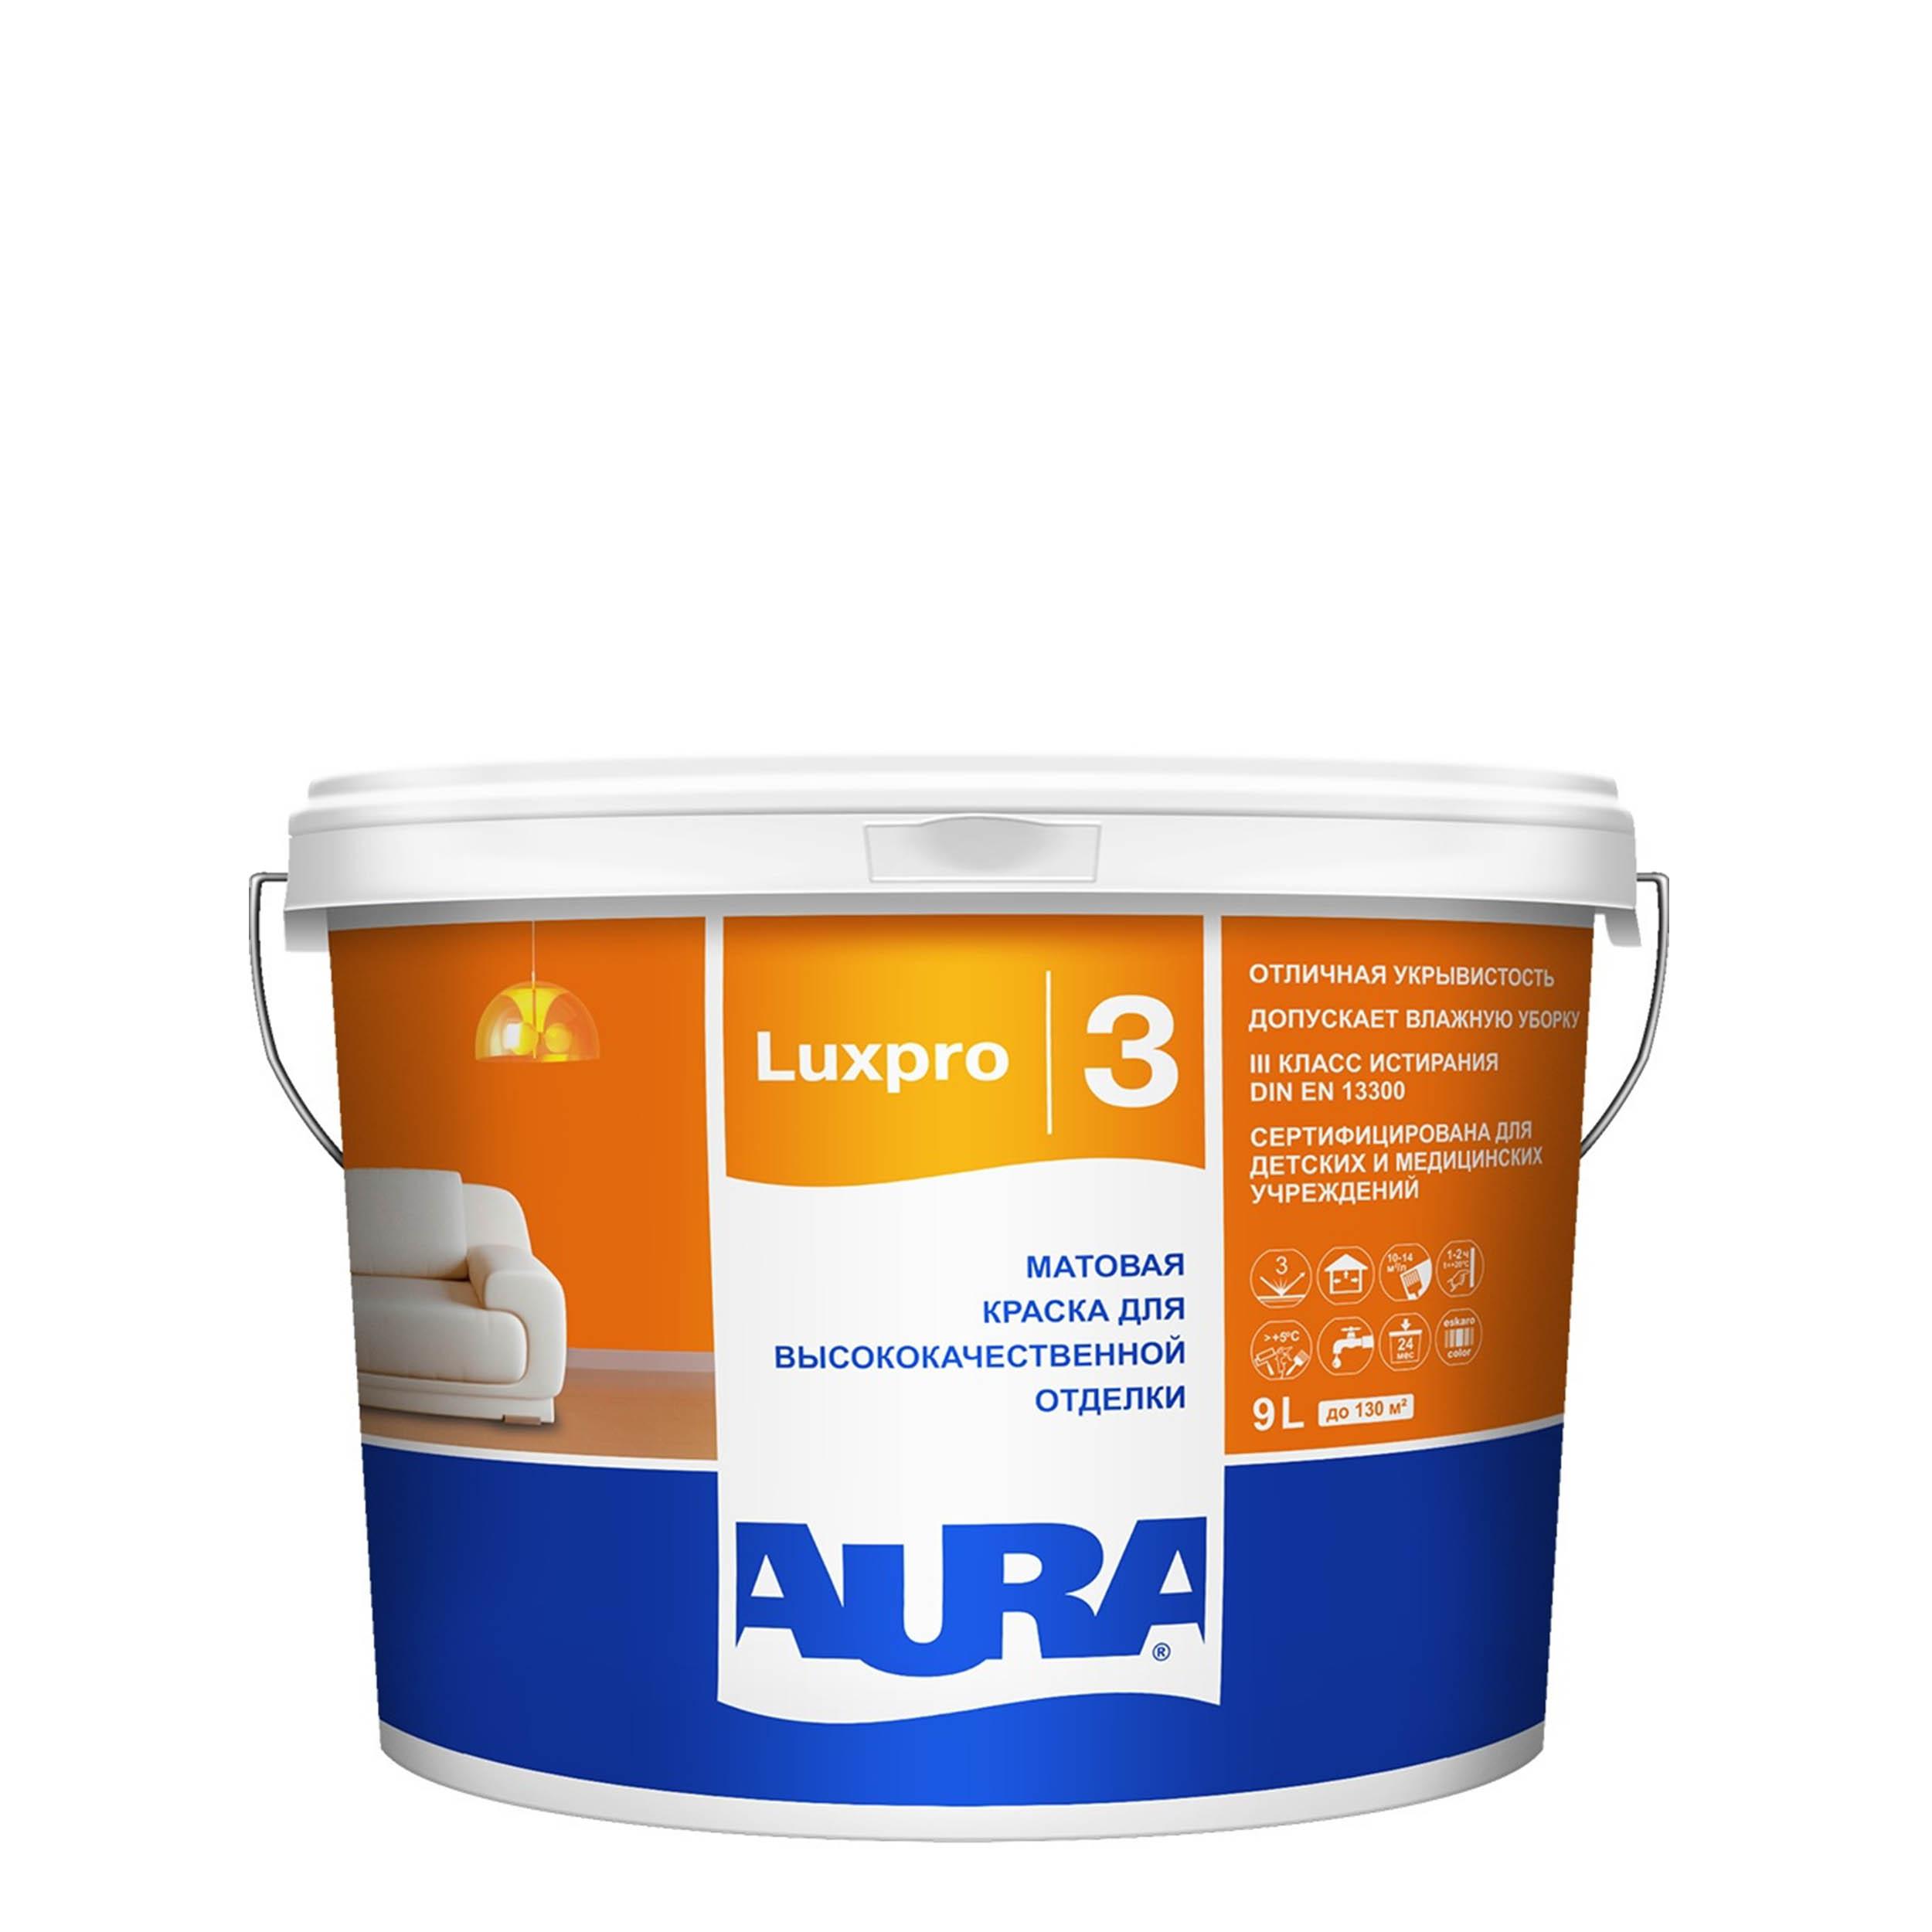 Фото 4 - Краска интерьерная, Aura LuxPRO 3, RAL 6026, 11 кг.